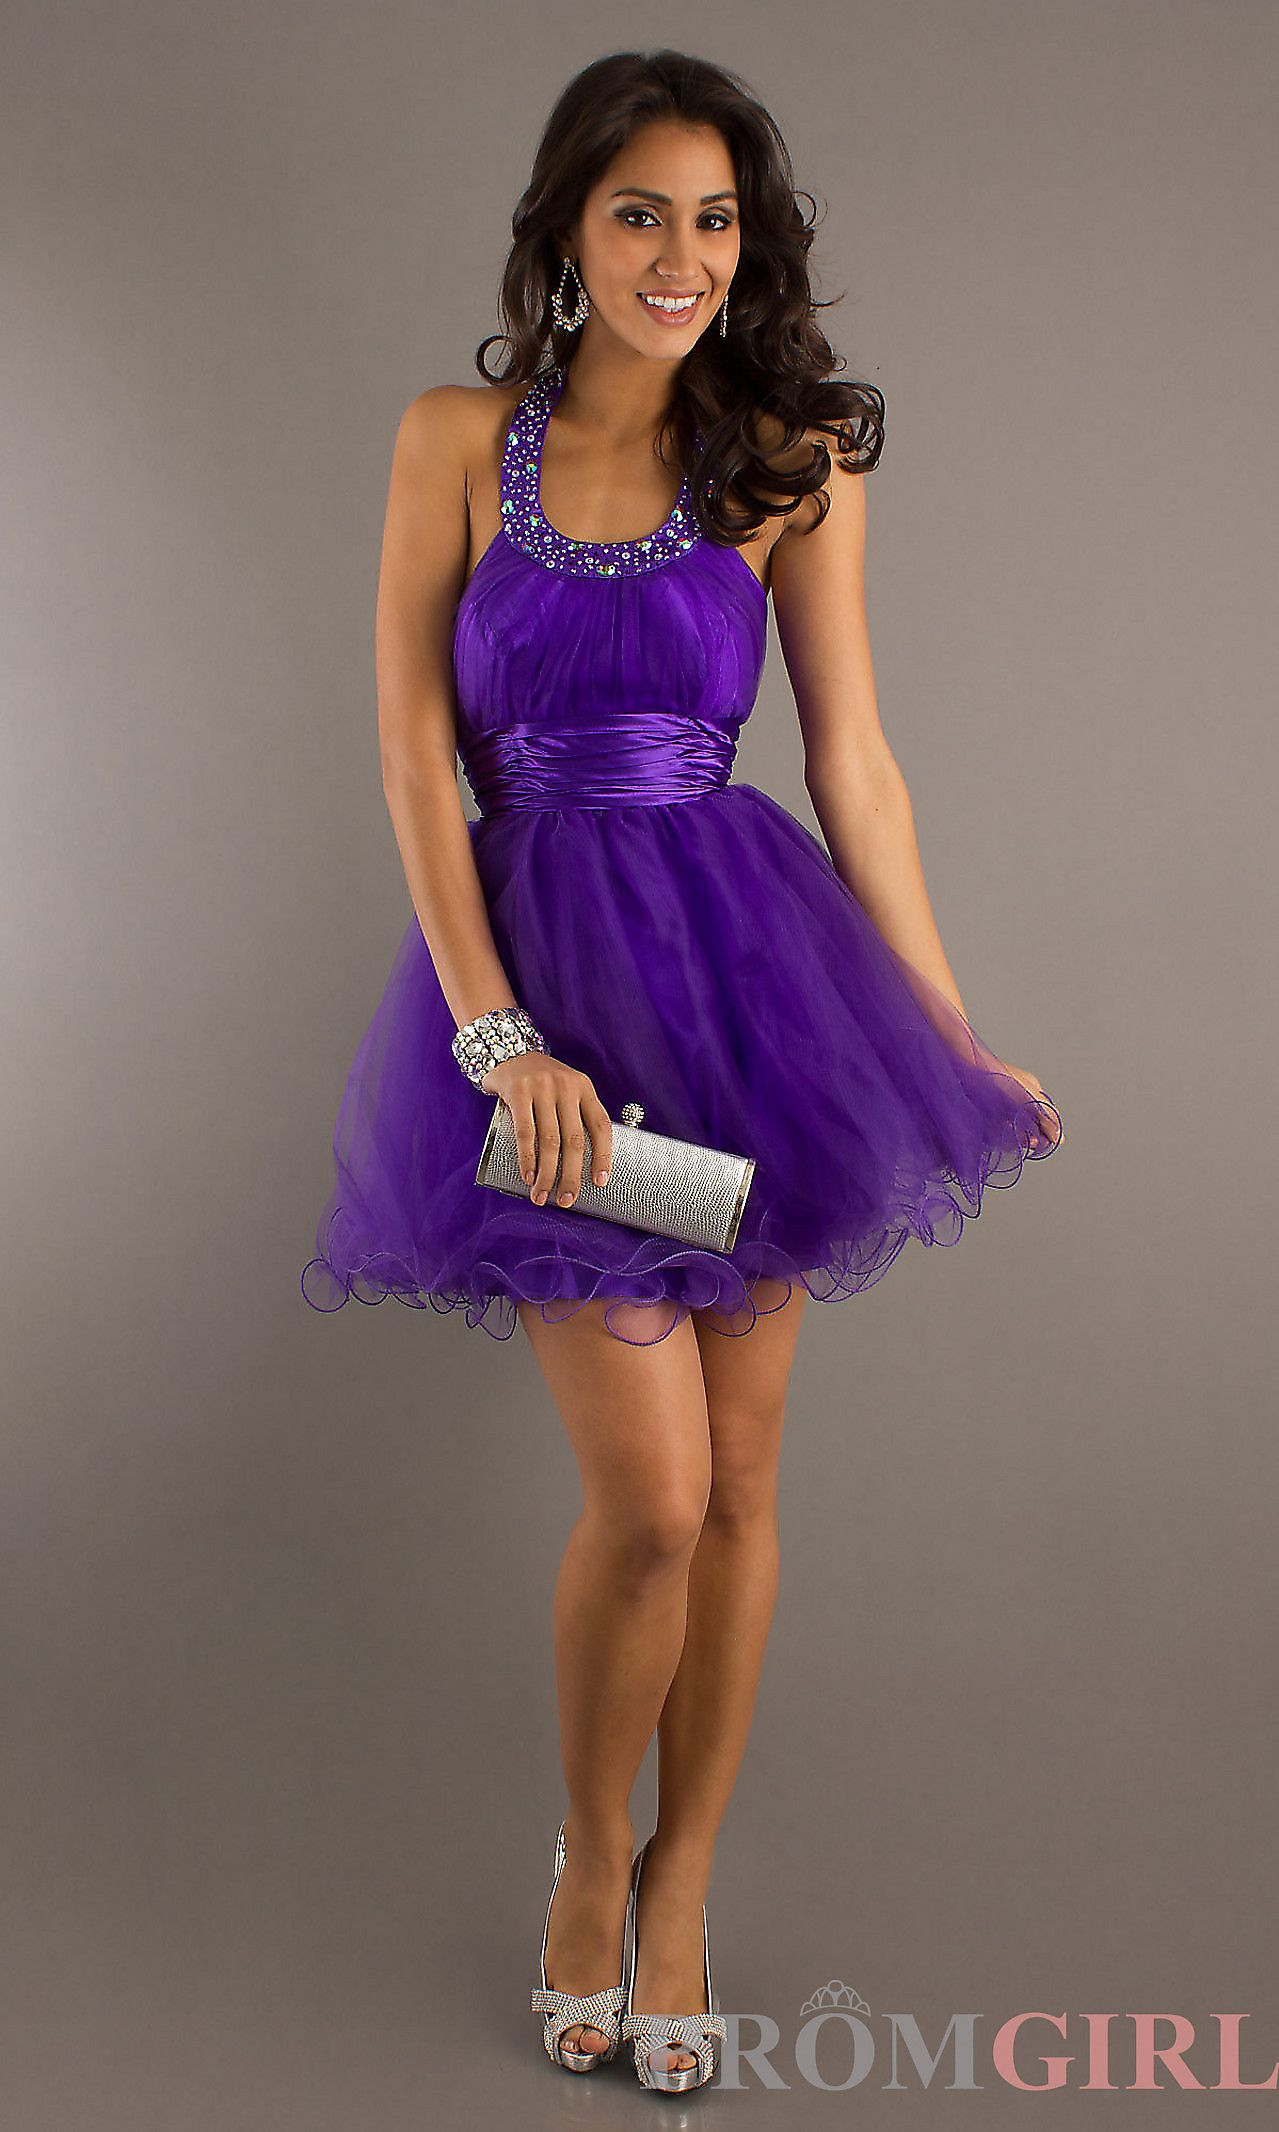 Short Empire Waist Tulle Dress DQ-8169   homecoming 2012   Pinterest